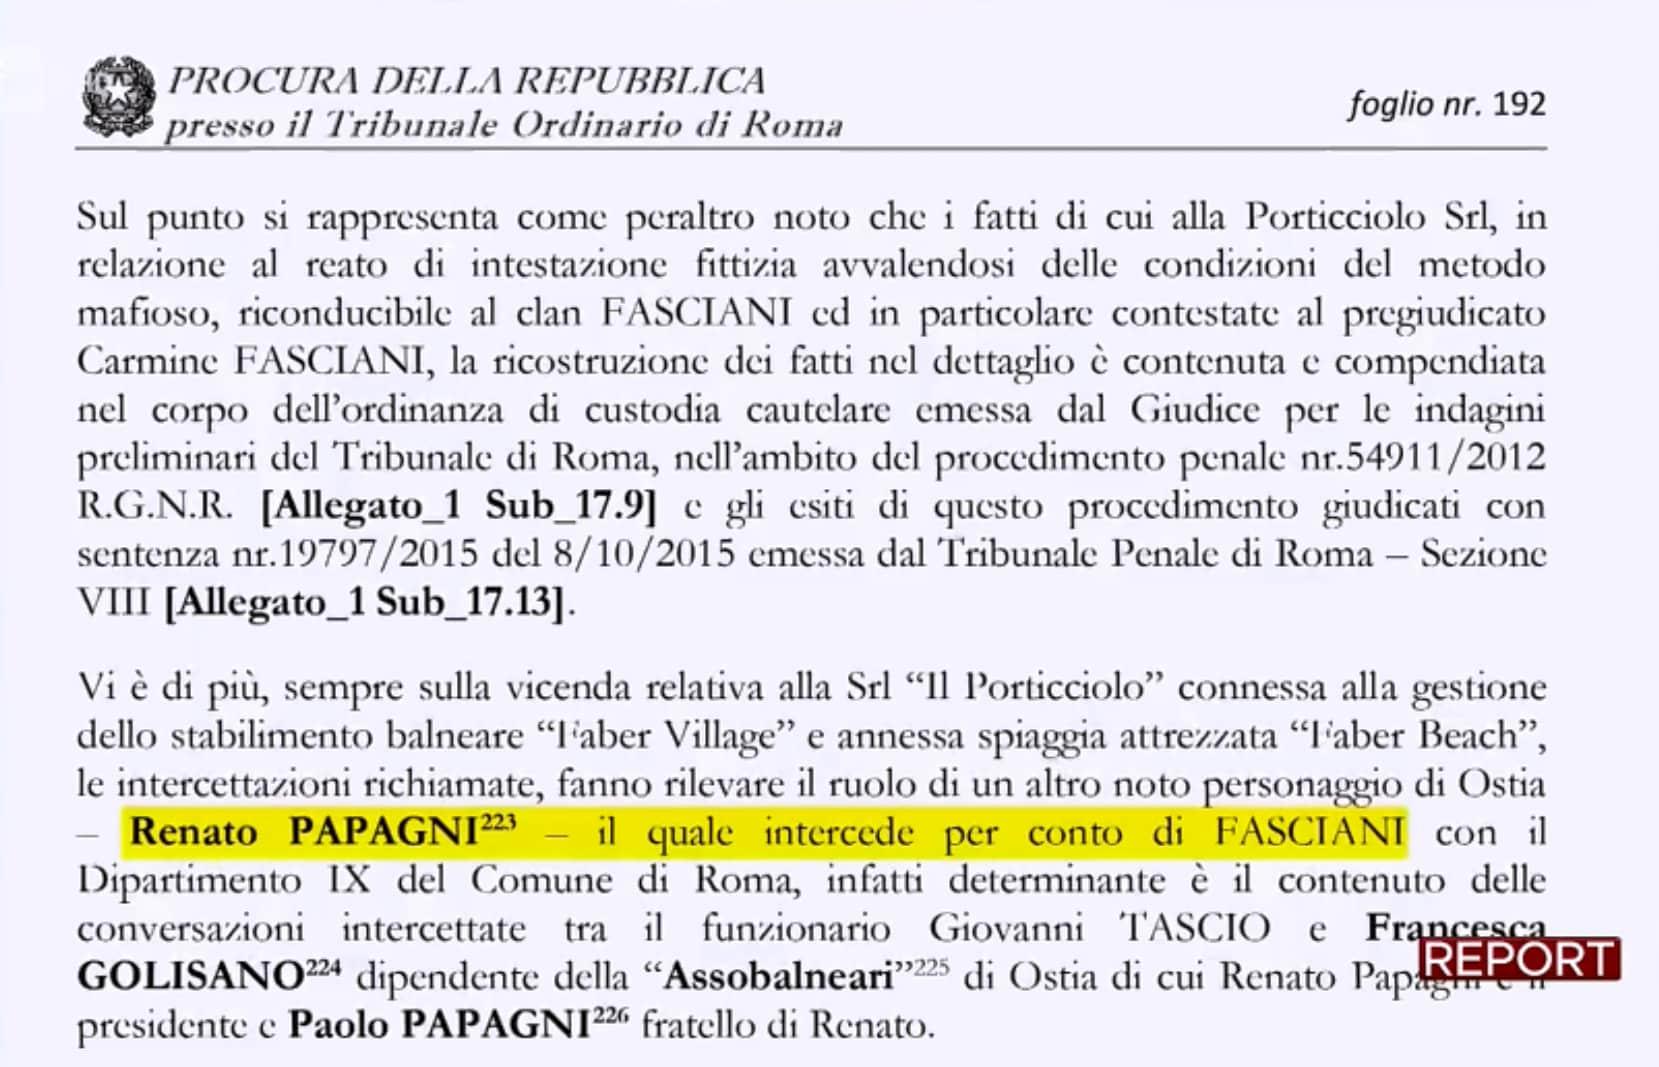 report ostia balneari libera spiaggia m5s papagni fasciani - 2